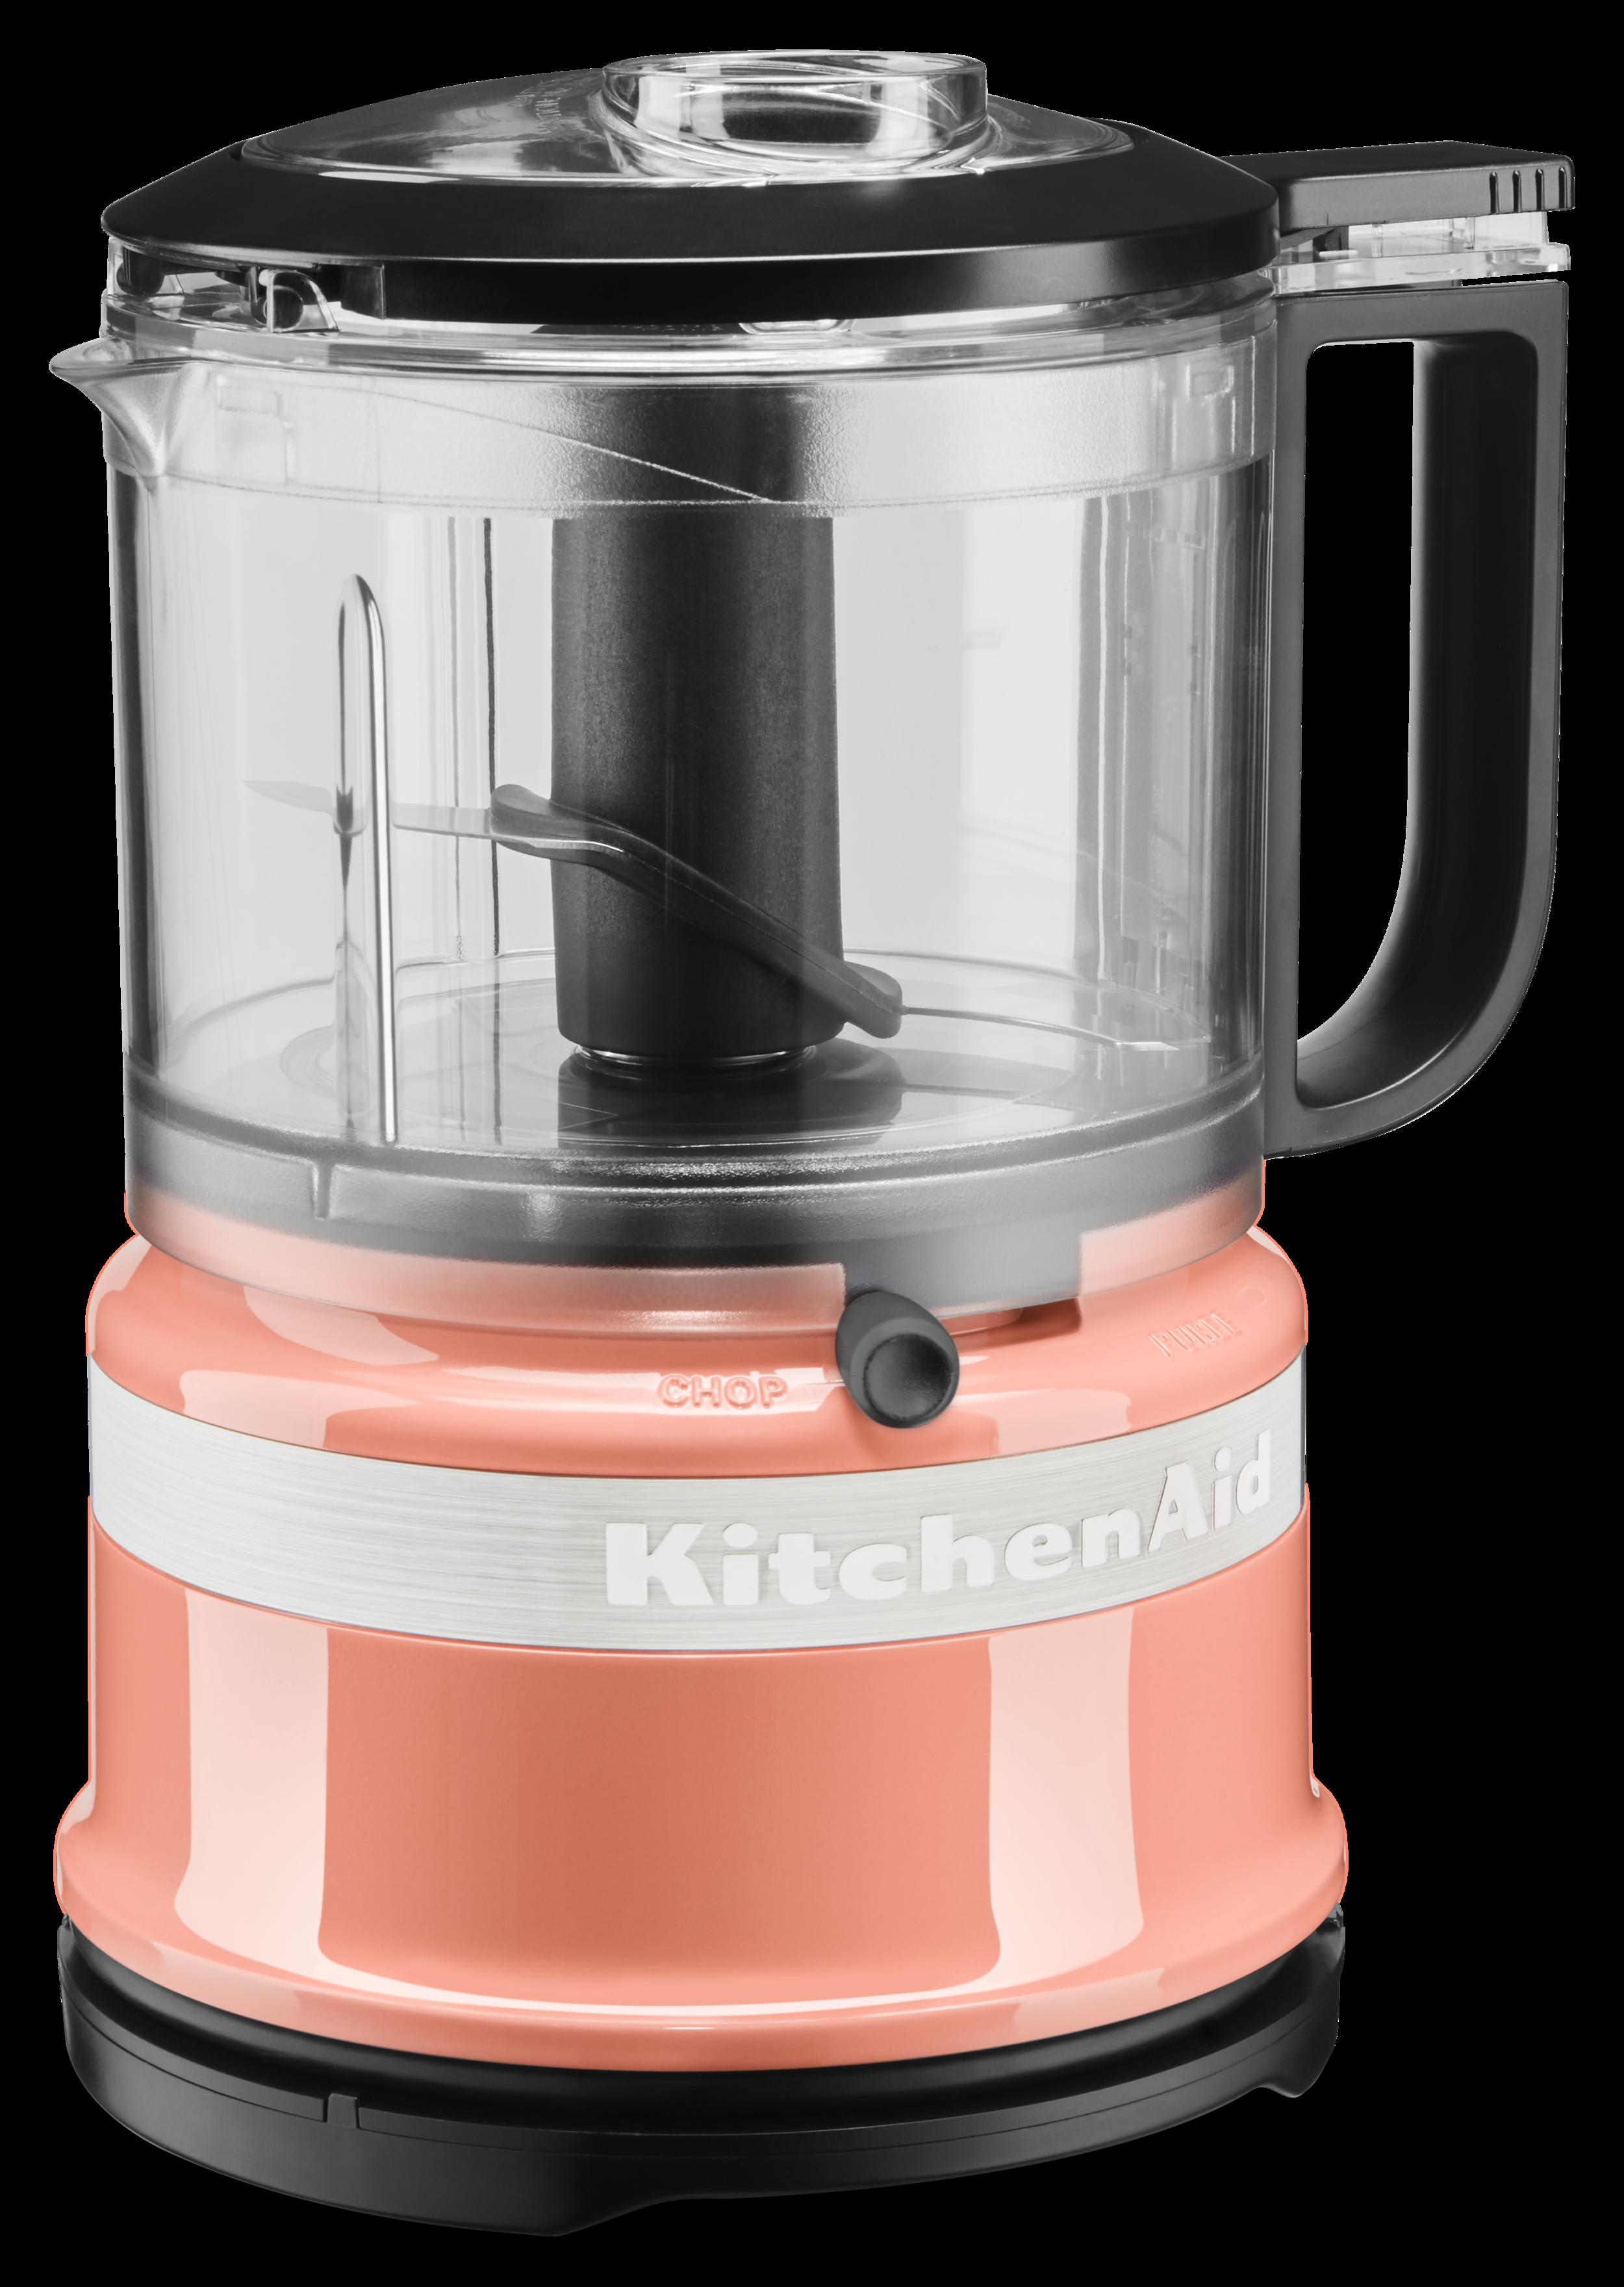 KitchenAid 3.5 Cup Mini Food Processor Bird of Paradise